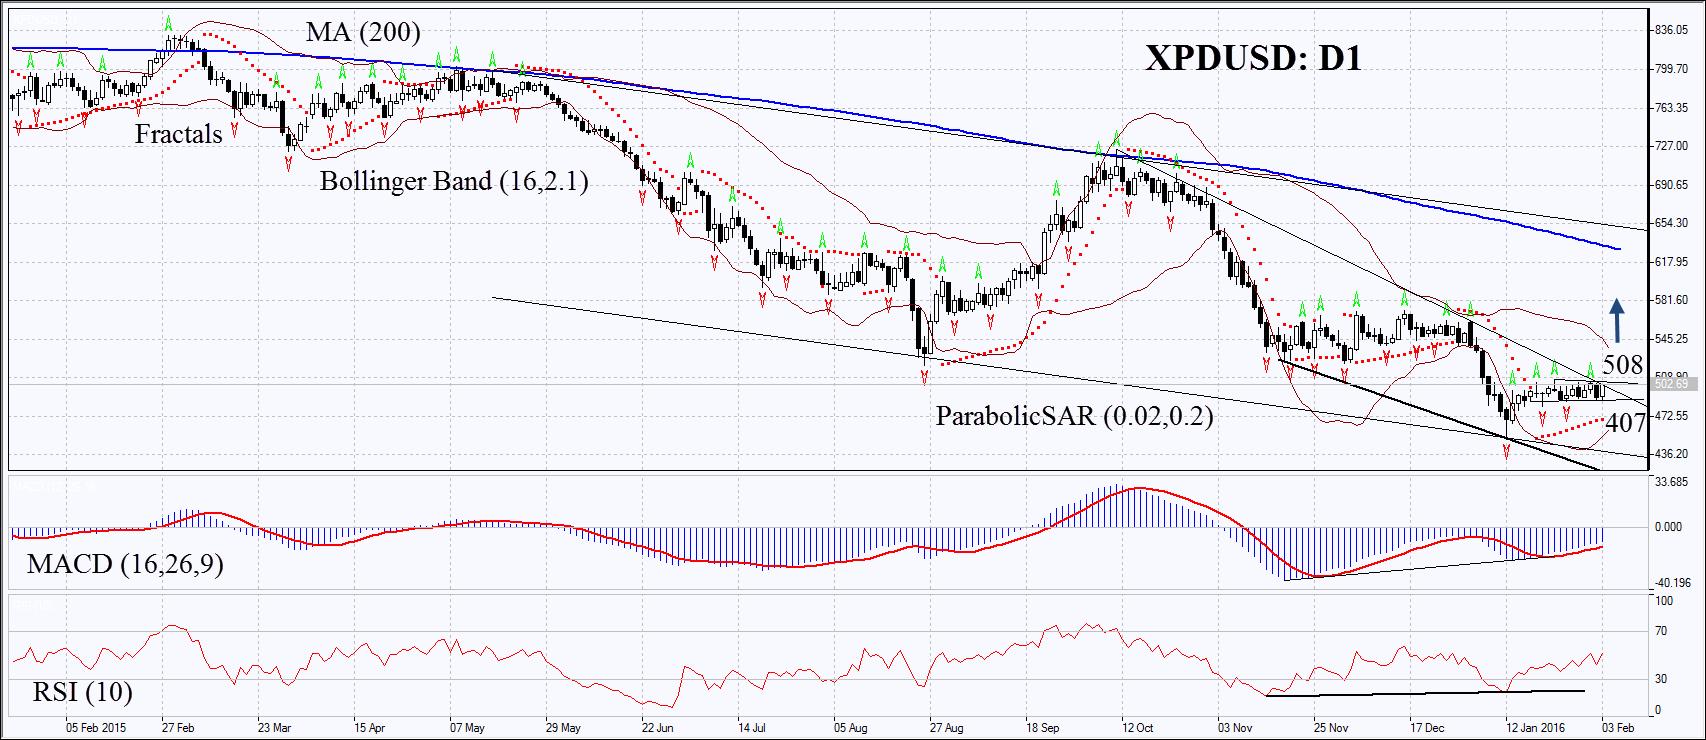 XPDUSD